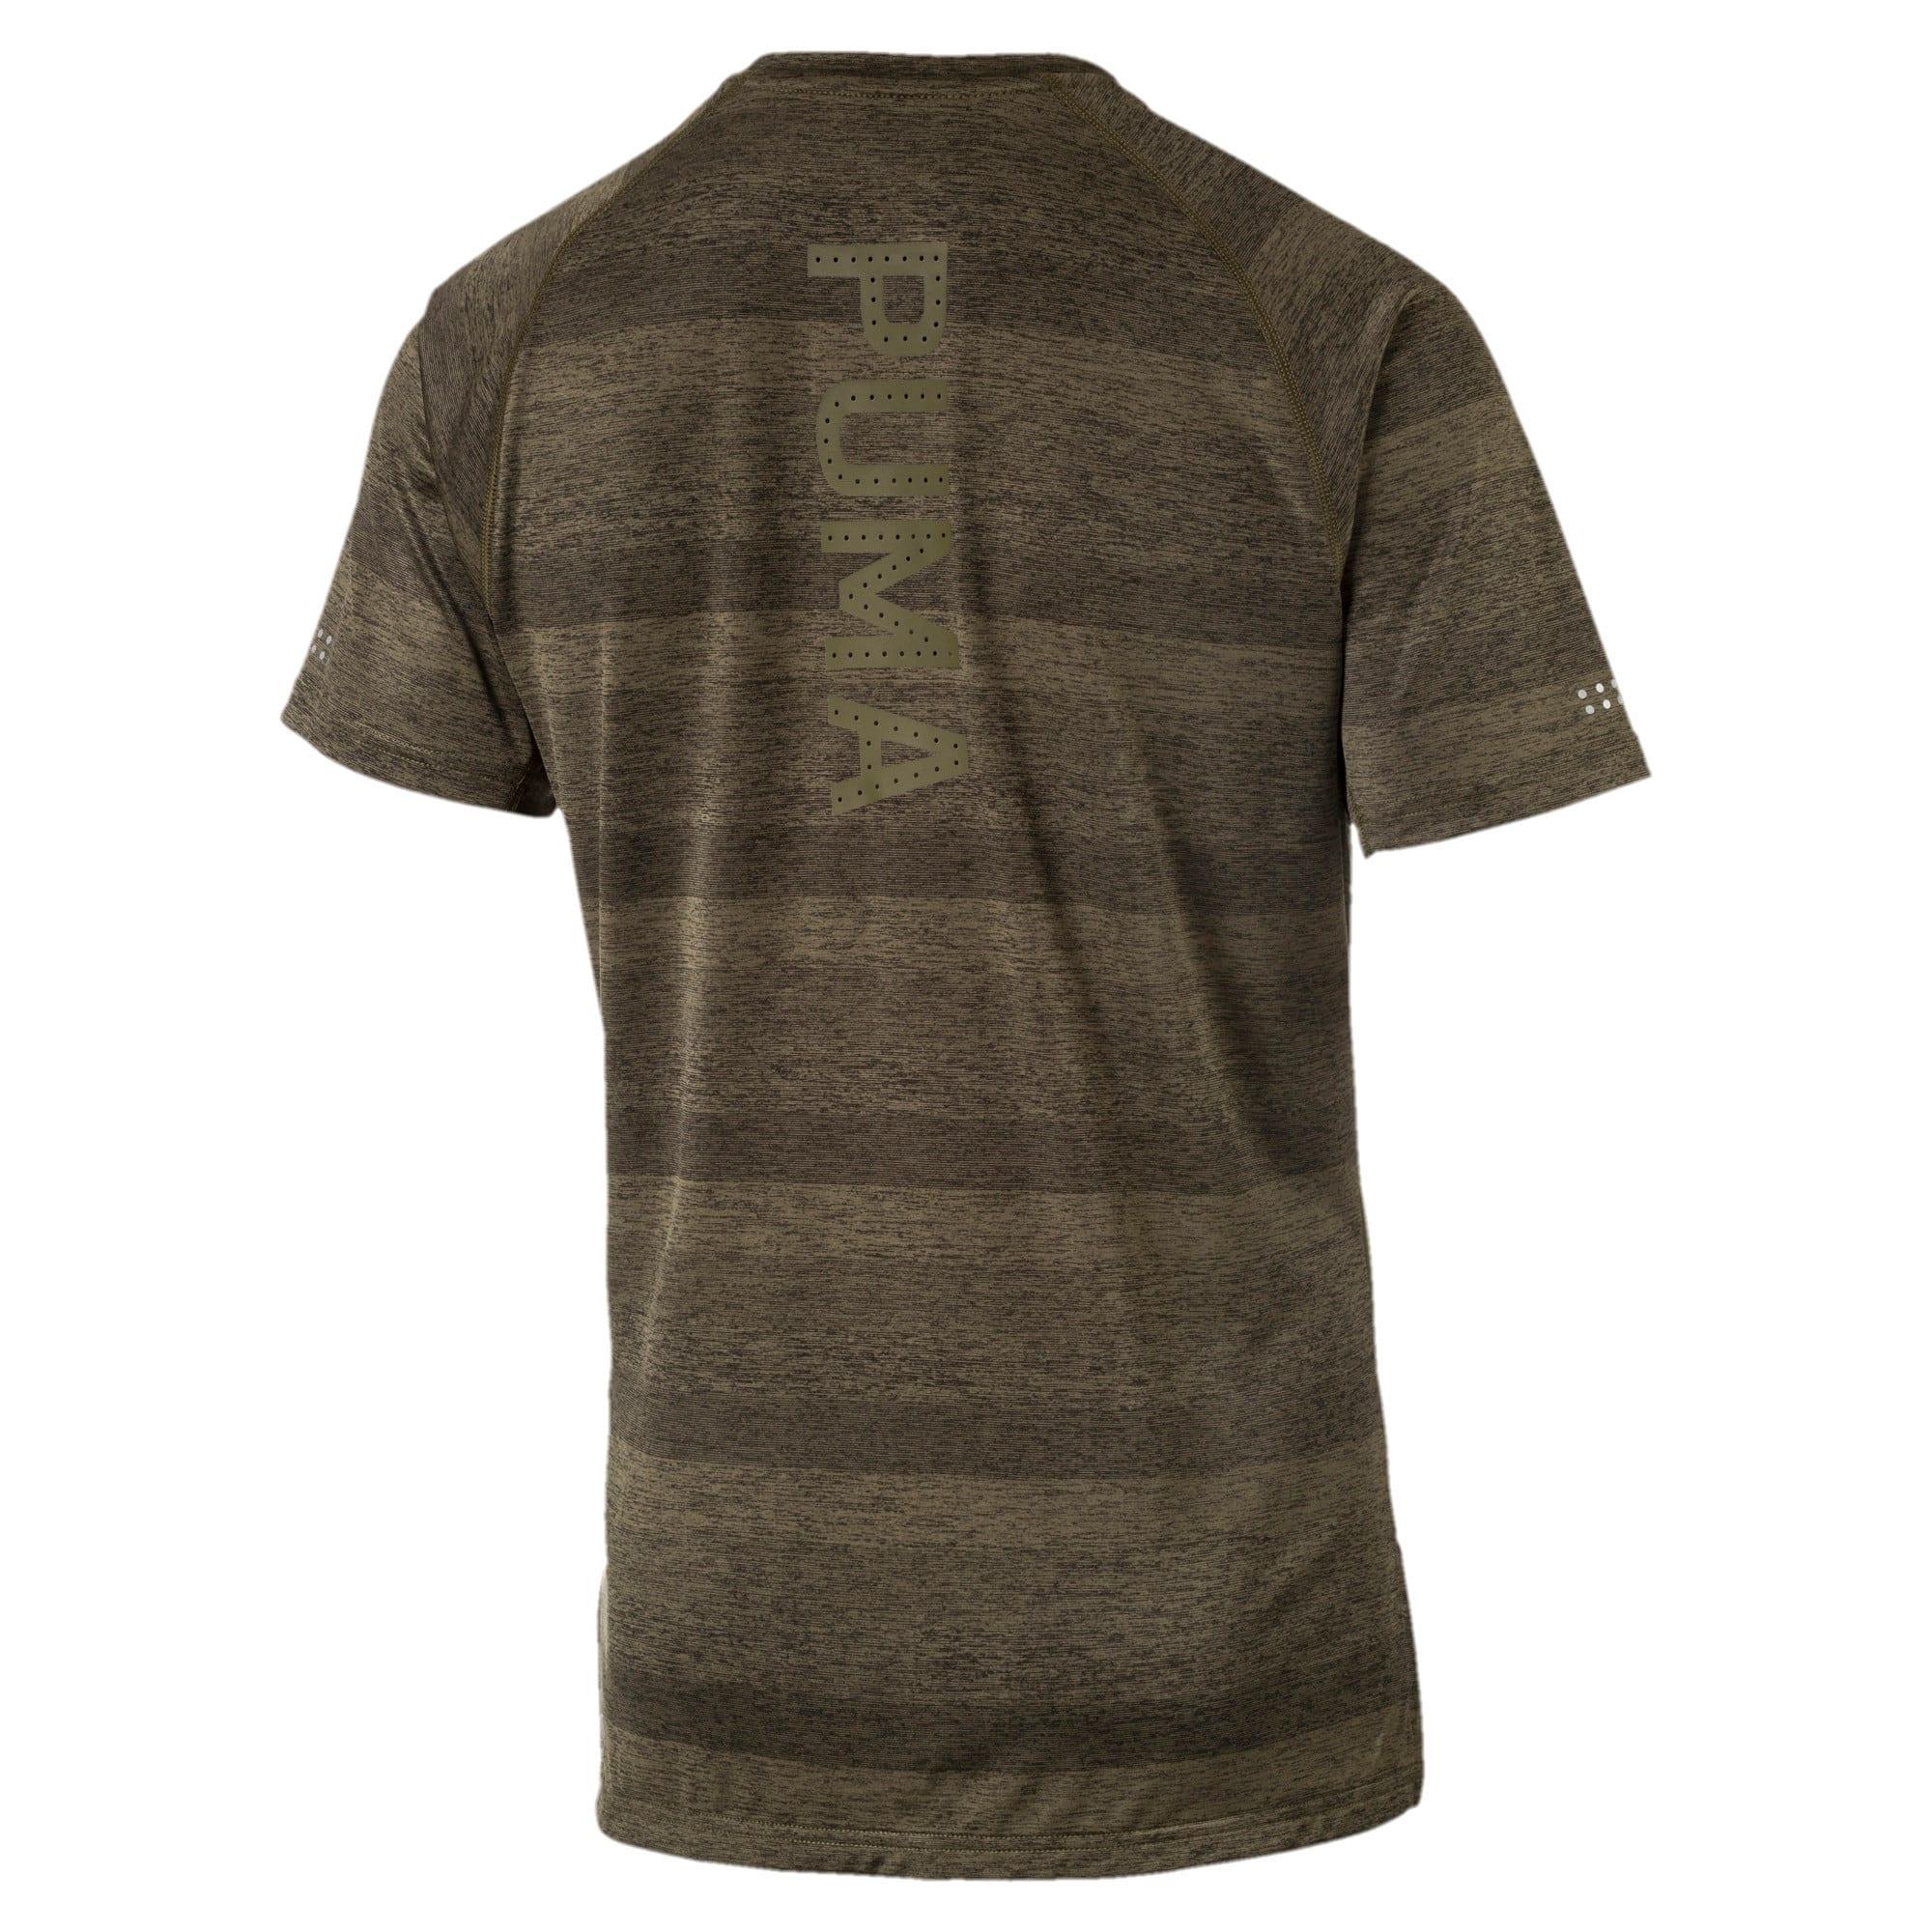 Thumbnail 5 of Running Men's Energy T-Shirt, Olive Night Heather, medium-IND